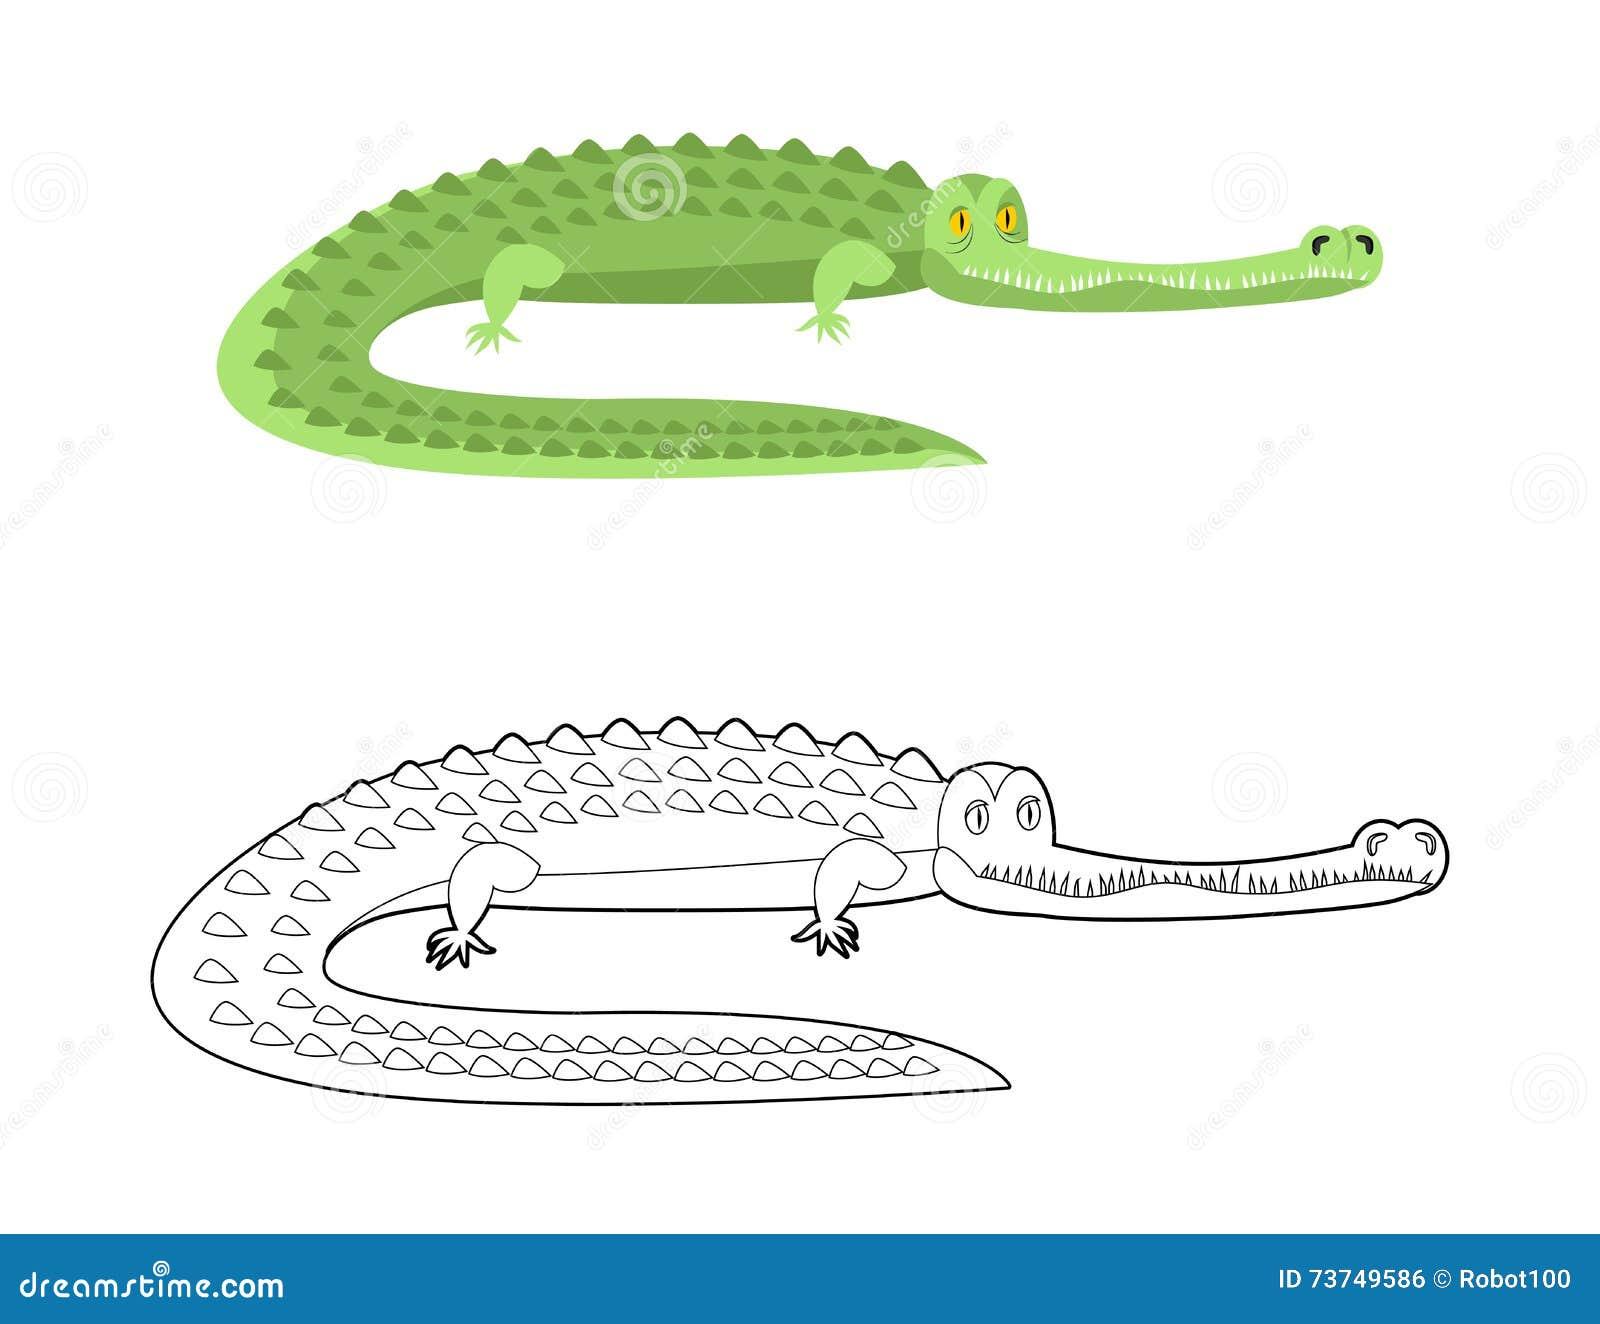 Coloriage Animaux Crocodile.Livre De Coloriage De Crocodile Bon Caiman Animal Sauvage